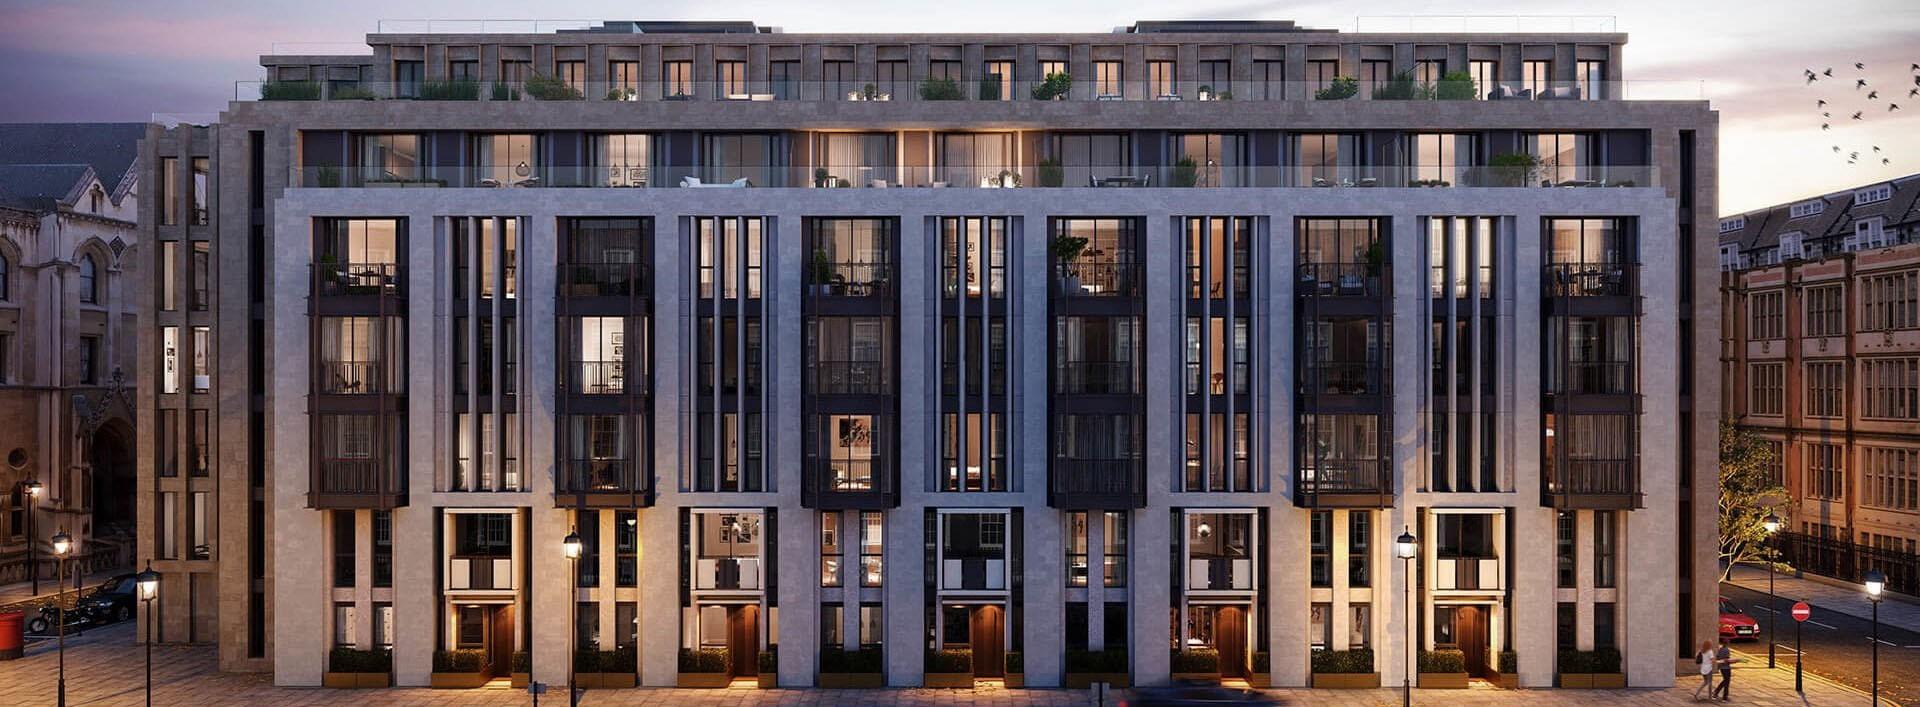 Full Dukkaboard Wetroom Specification for Lincoln Square Development